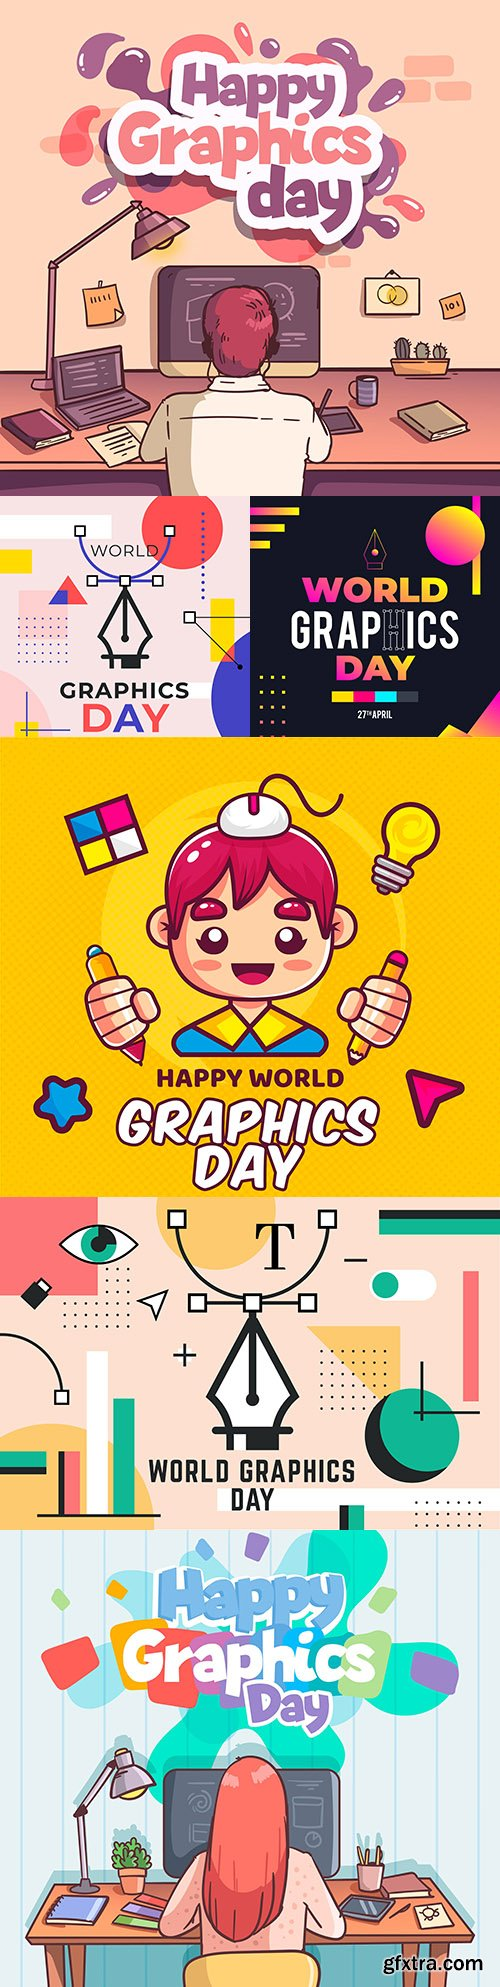 World Graphic day painted illustration flat design